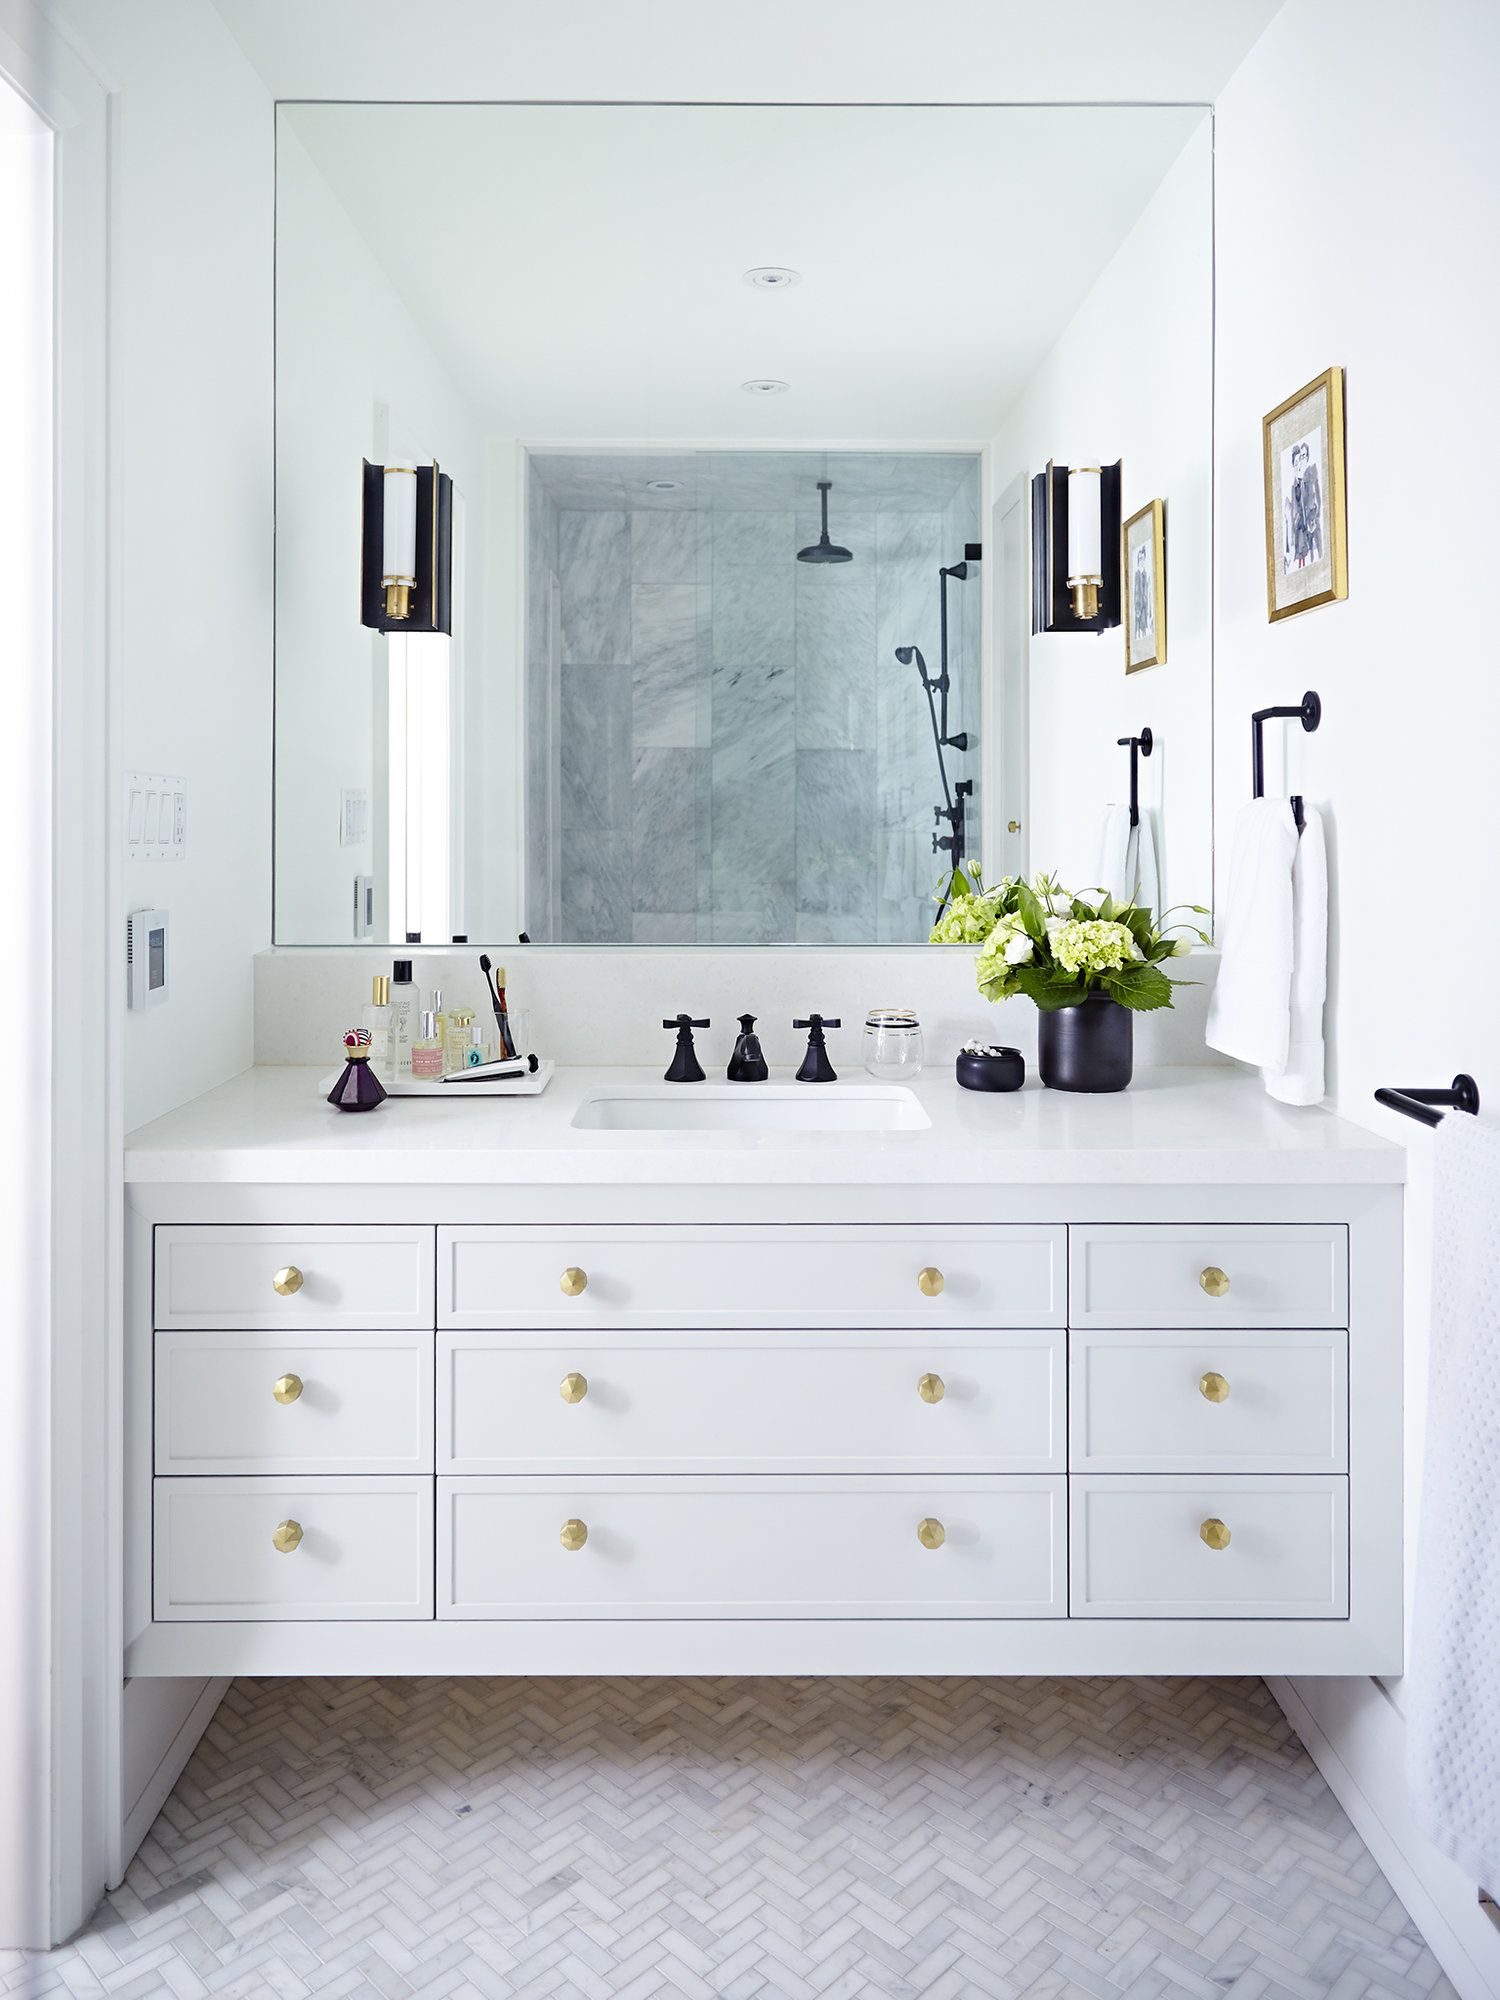 White Modern Bathroom With Brass Hardware Feasby Bleeks Design All White Bathroom Bathroom Interior Bathroom Design